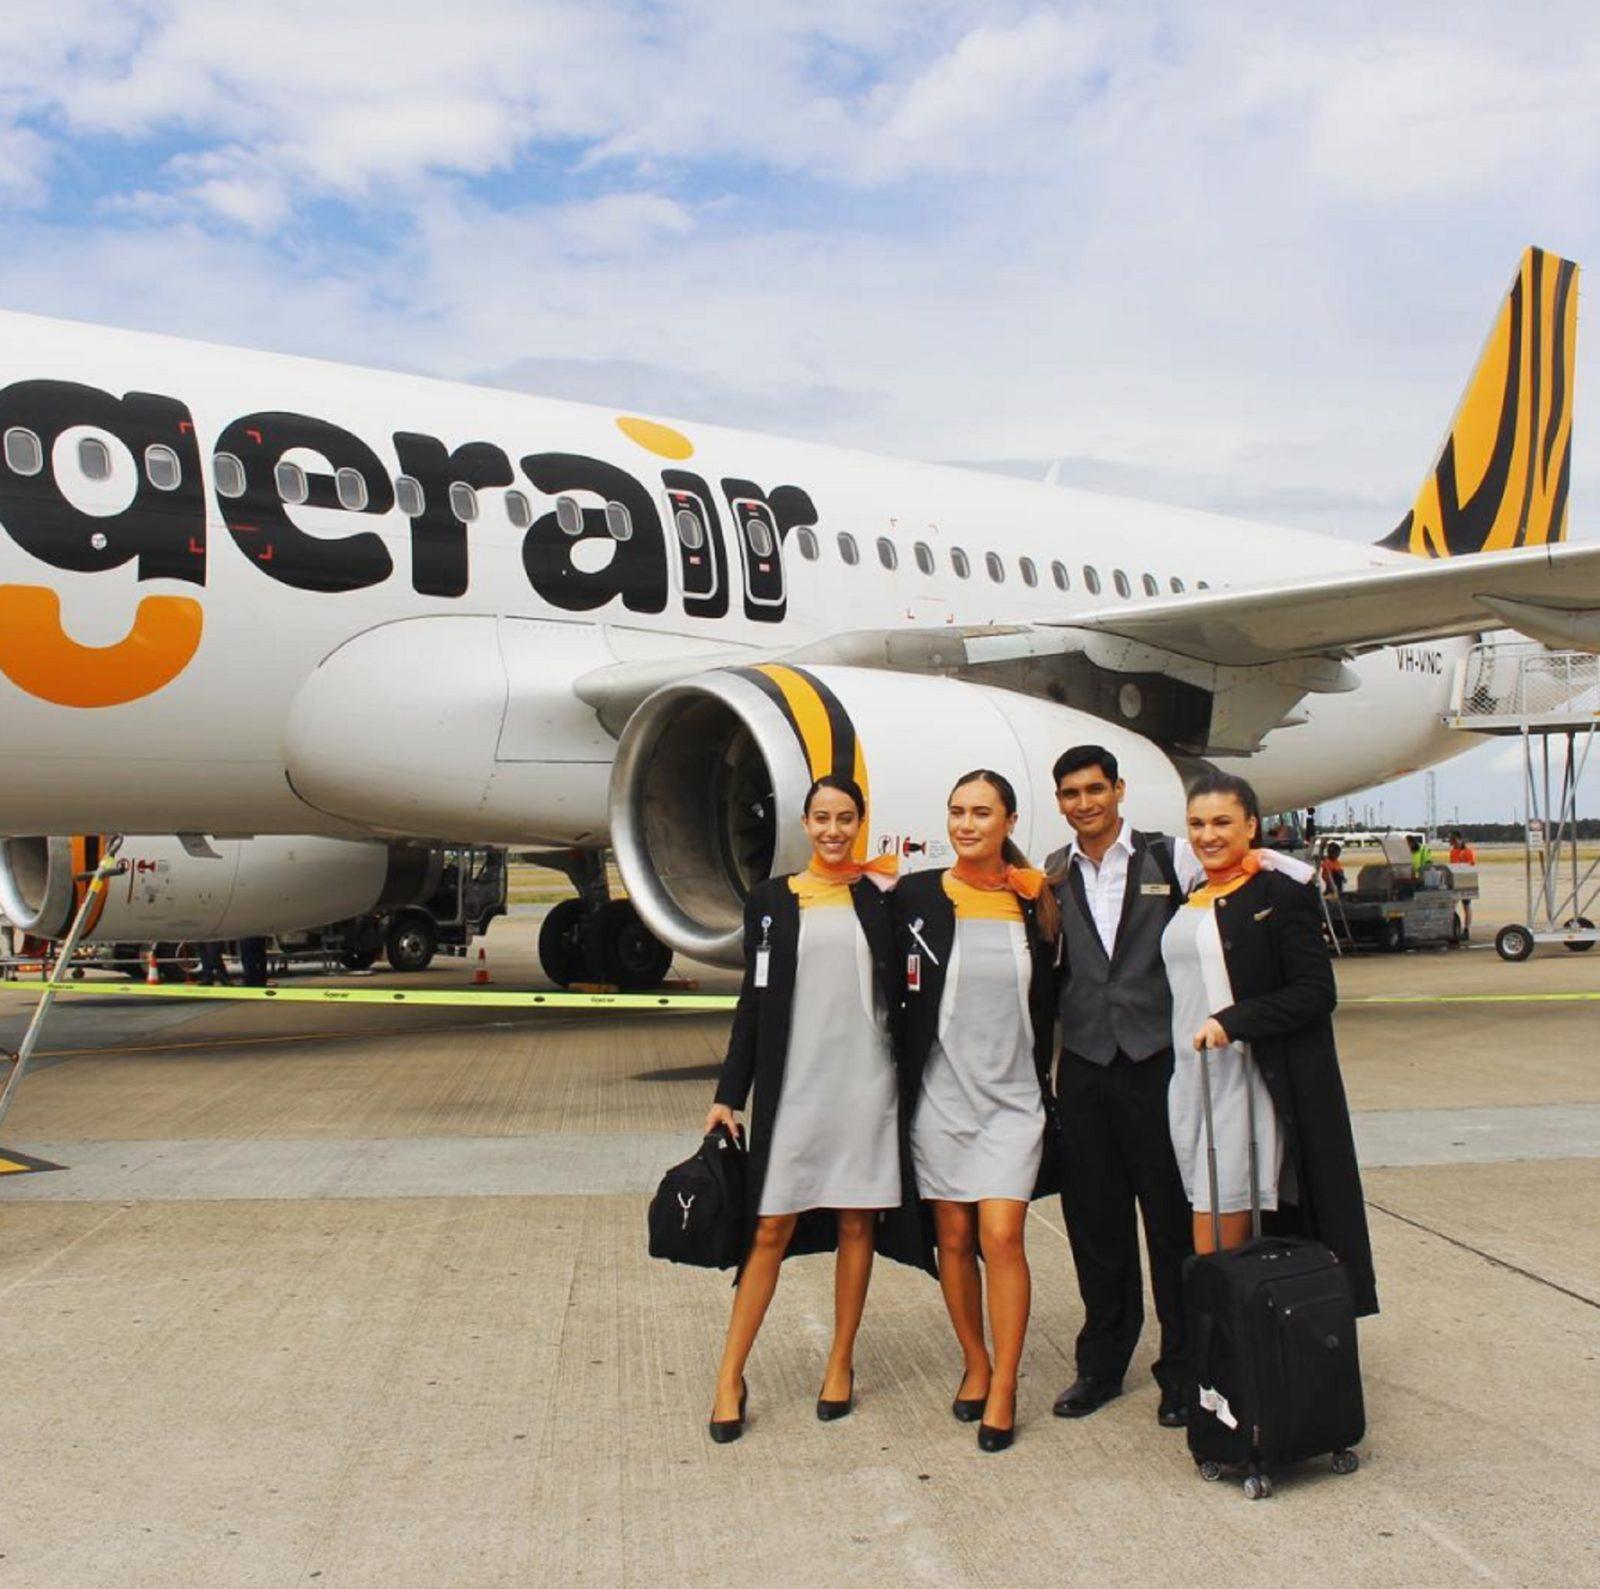 Tigerair Australia, Perth, Western Australia